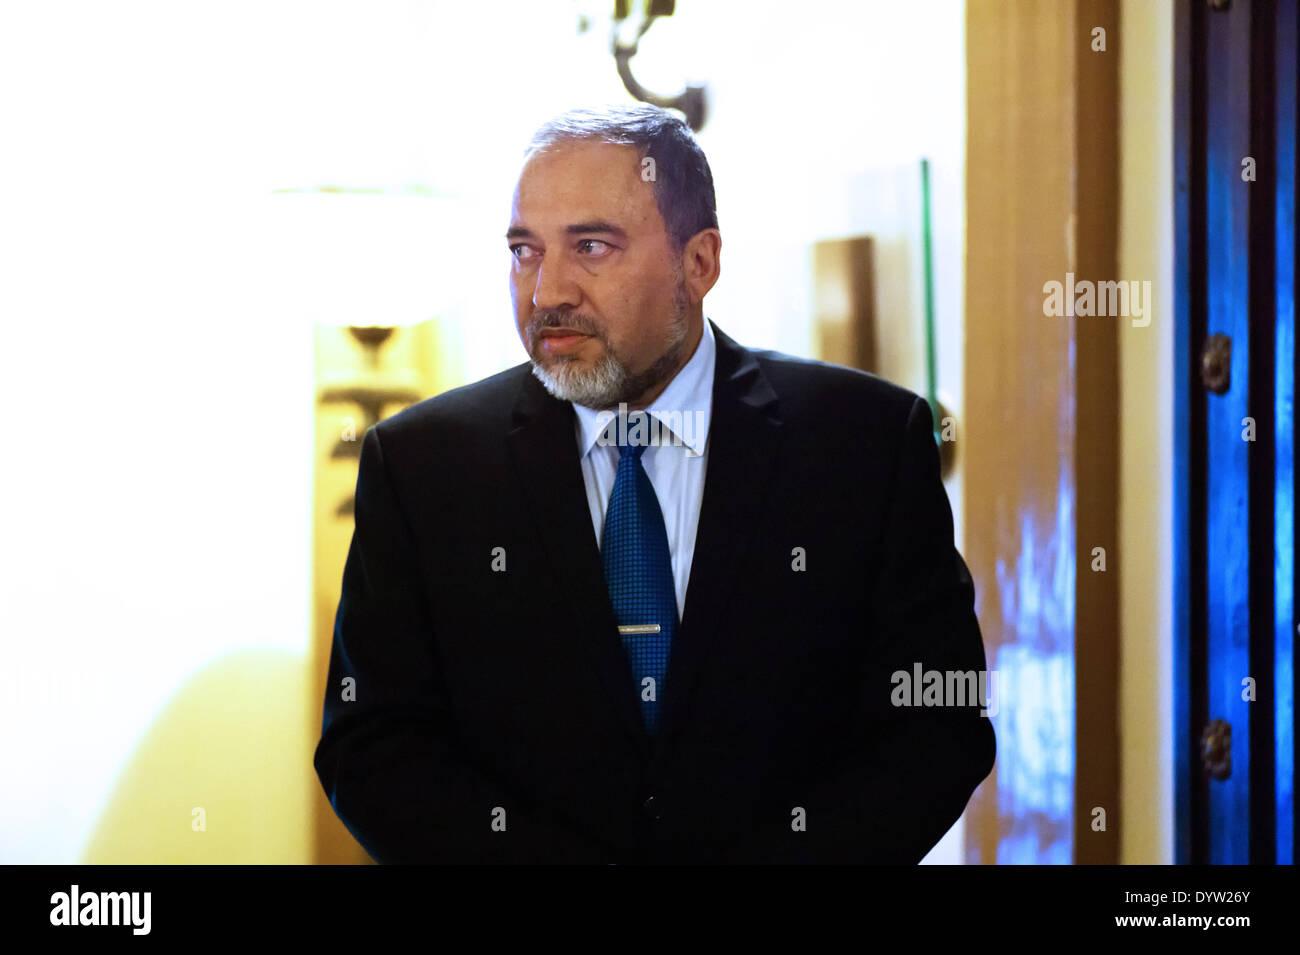 Avigdor Lieberman - Stock Image